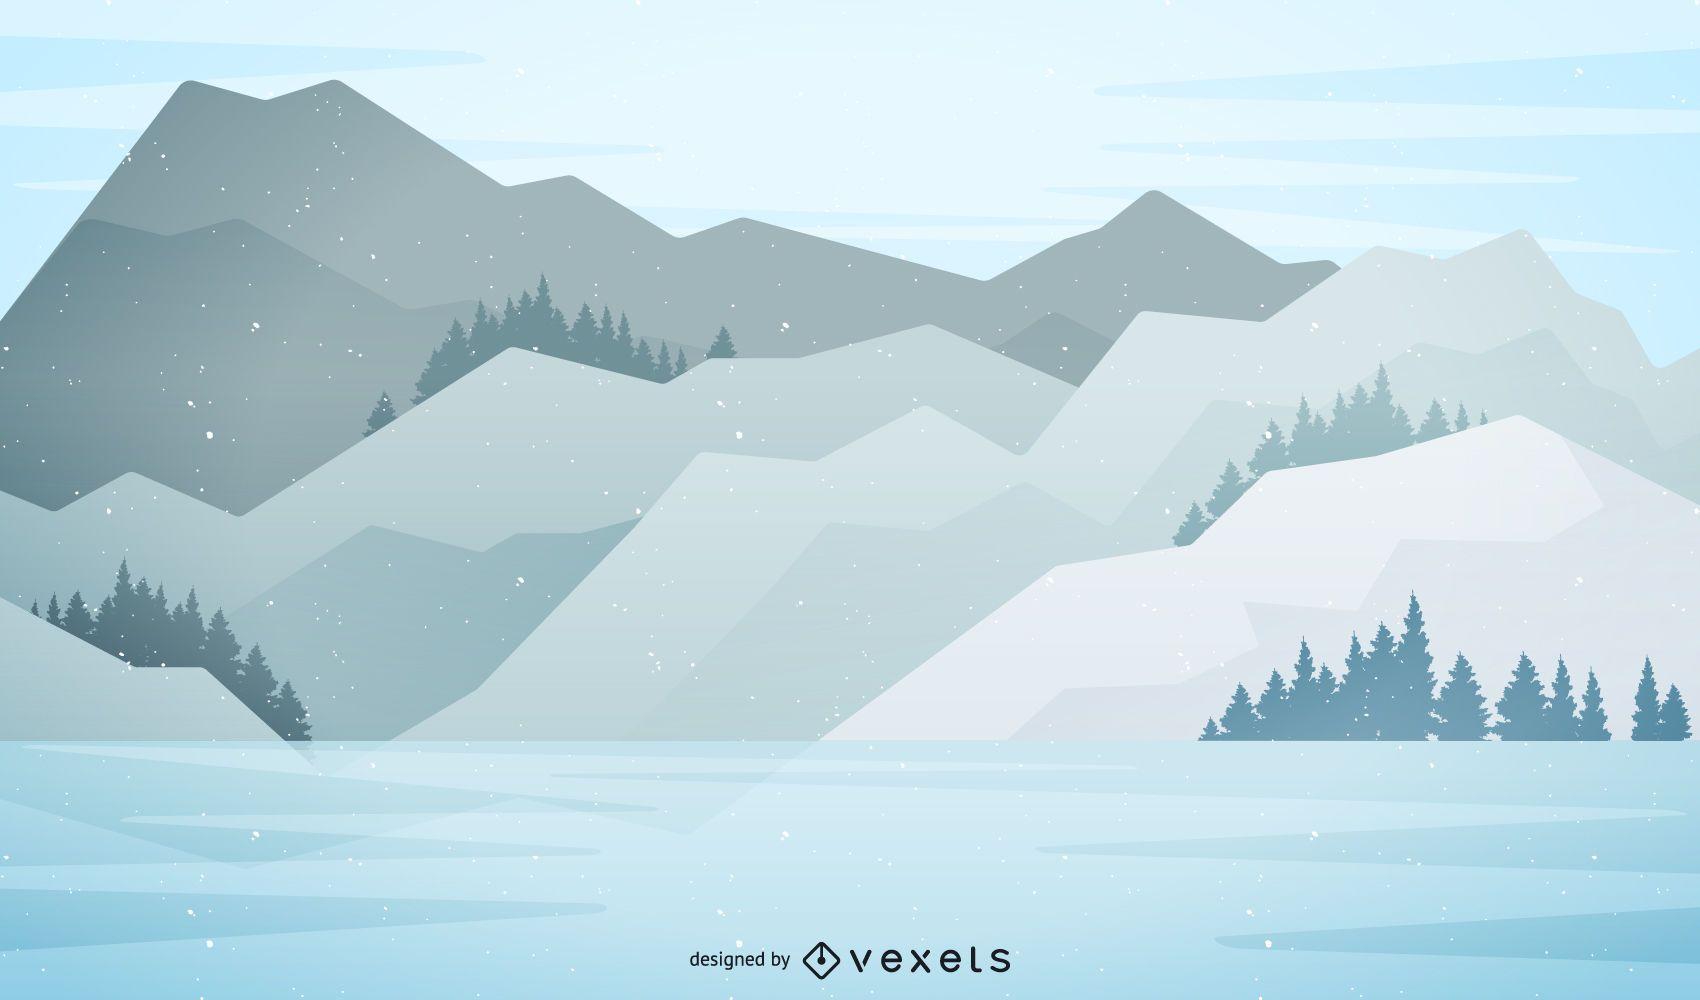 Snowy Mountain Landscape Illustration Landscape Illustration Mountain Landscape Illustration